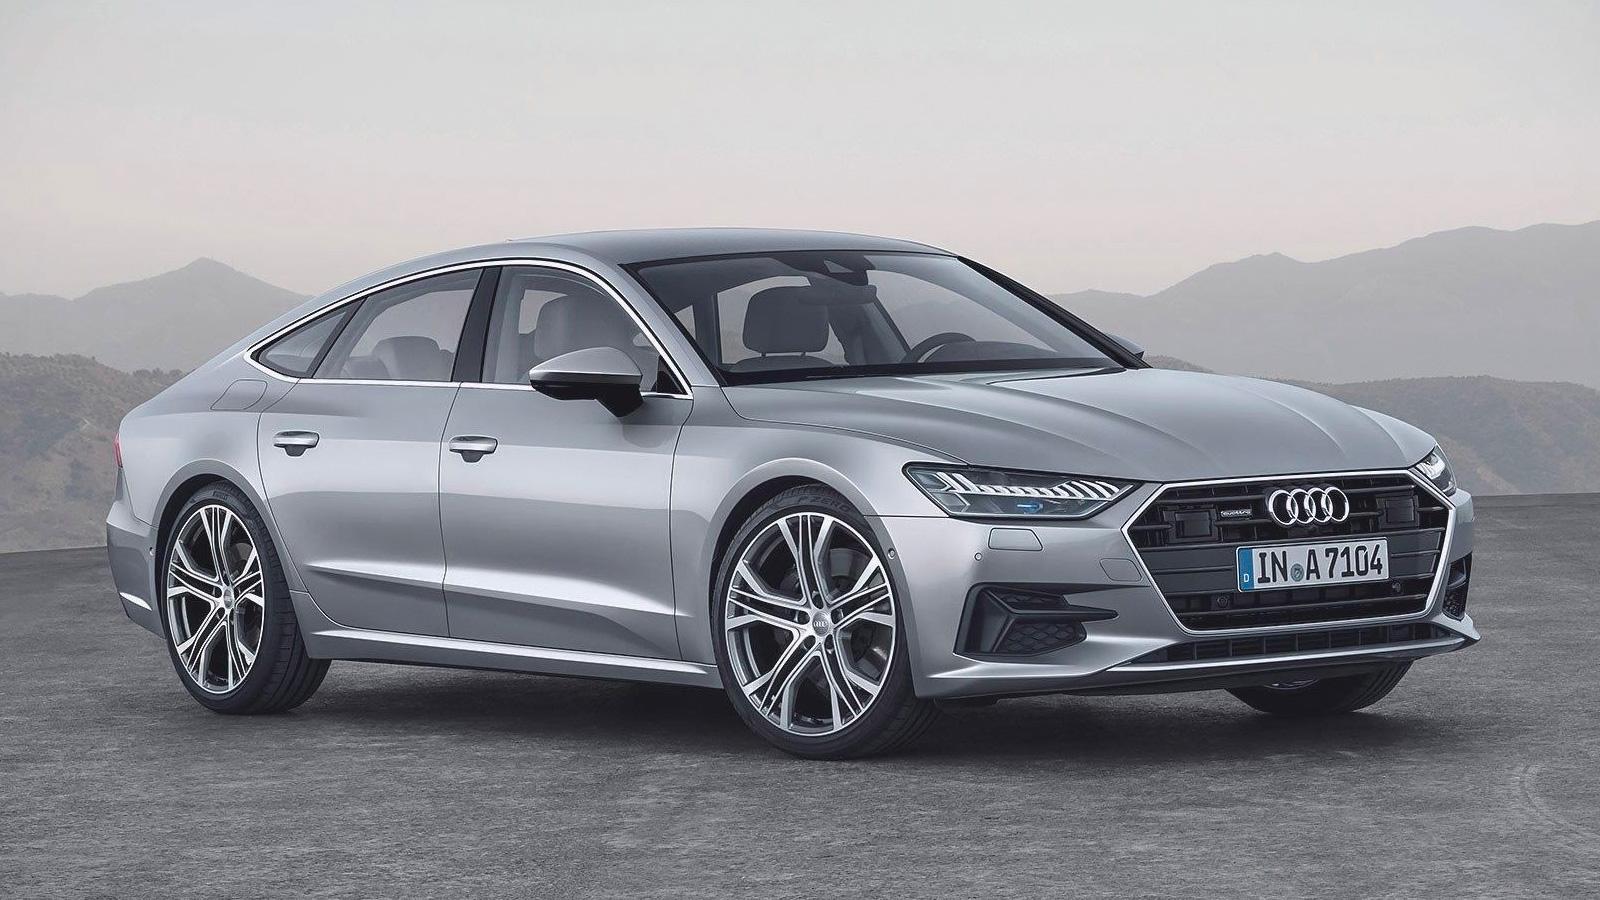 Audi Rs7 0-60 >> Audi Rs7 Vs Bmw M5 Miami Lusso